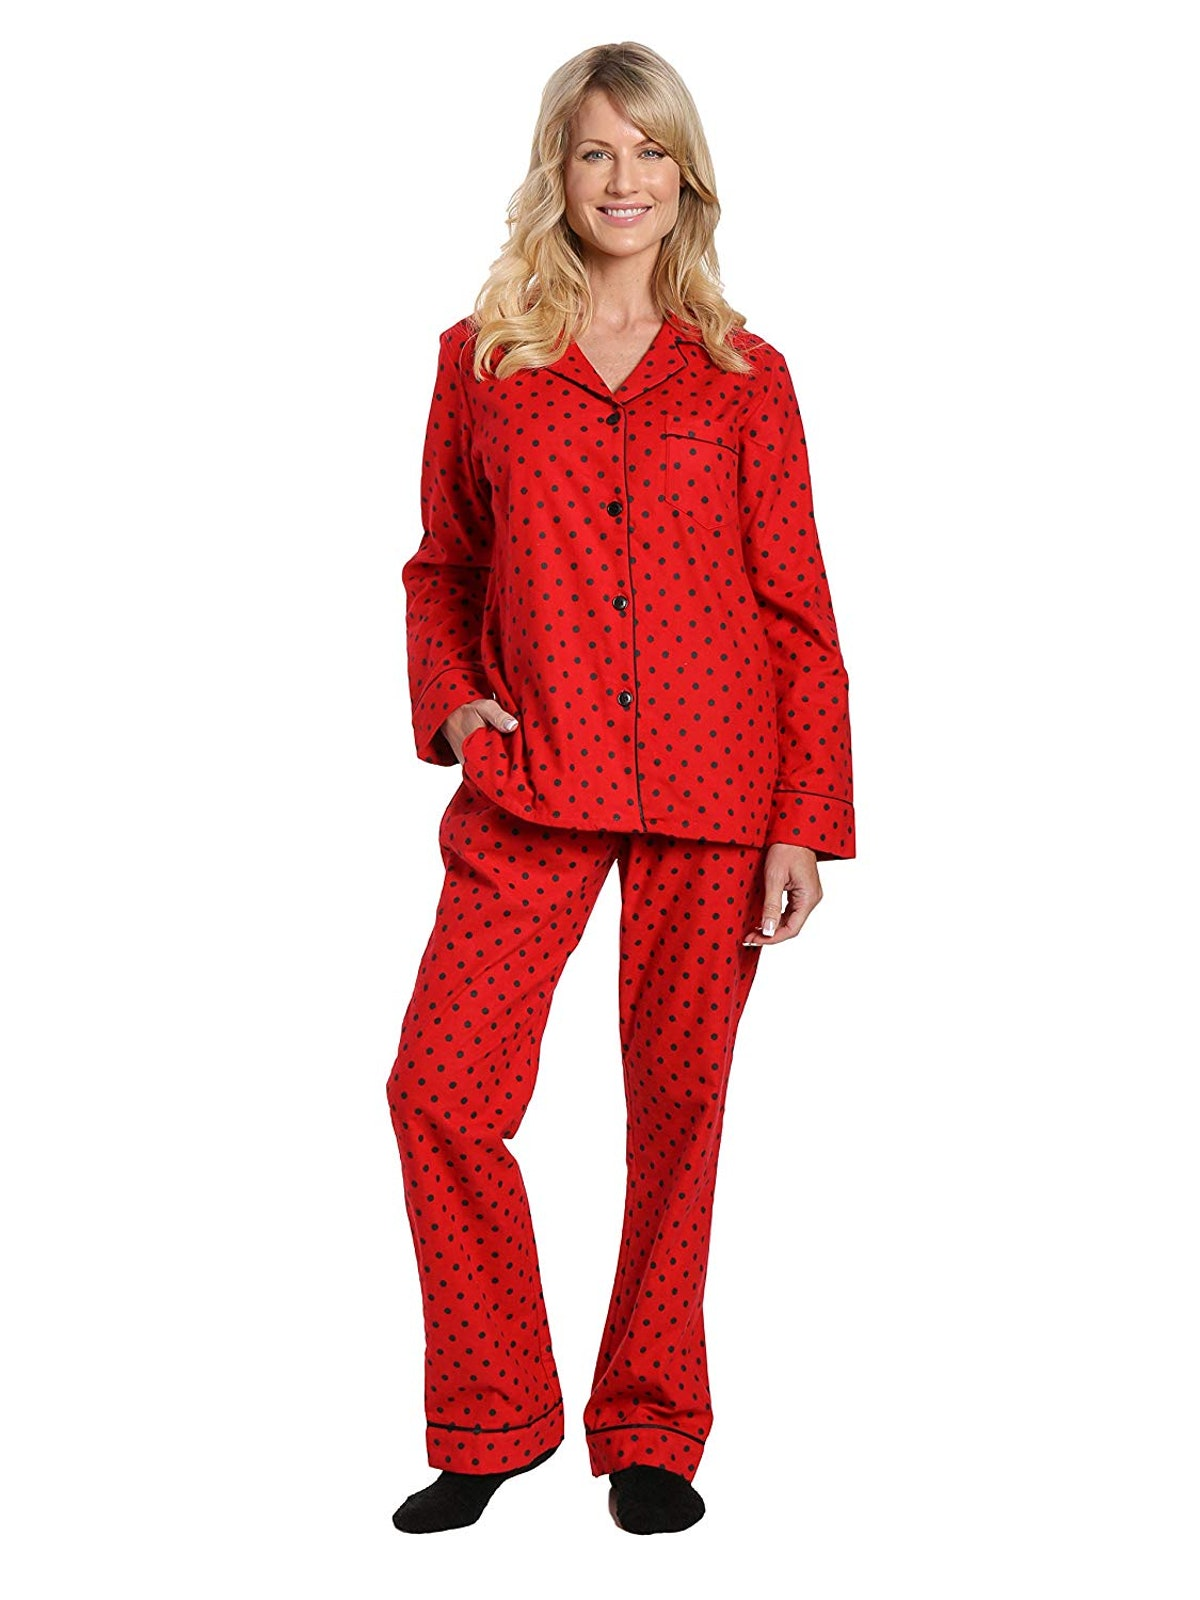 Noble Mount Women's Cotton Flannel Pajama Sleepwear Set